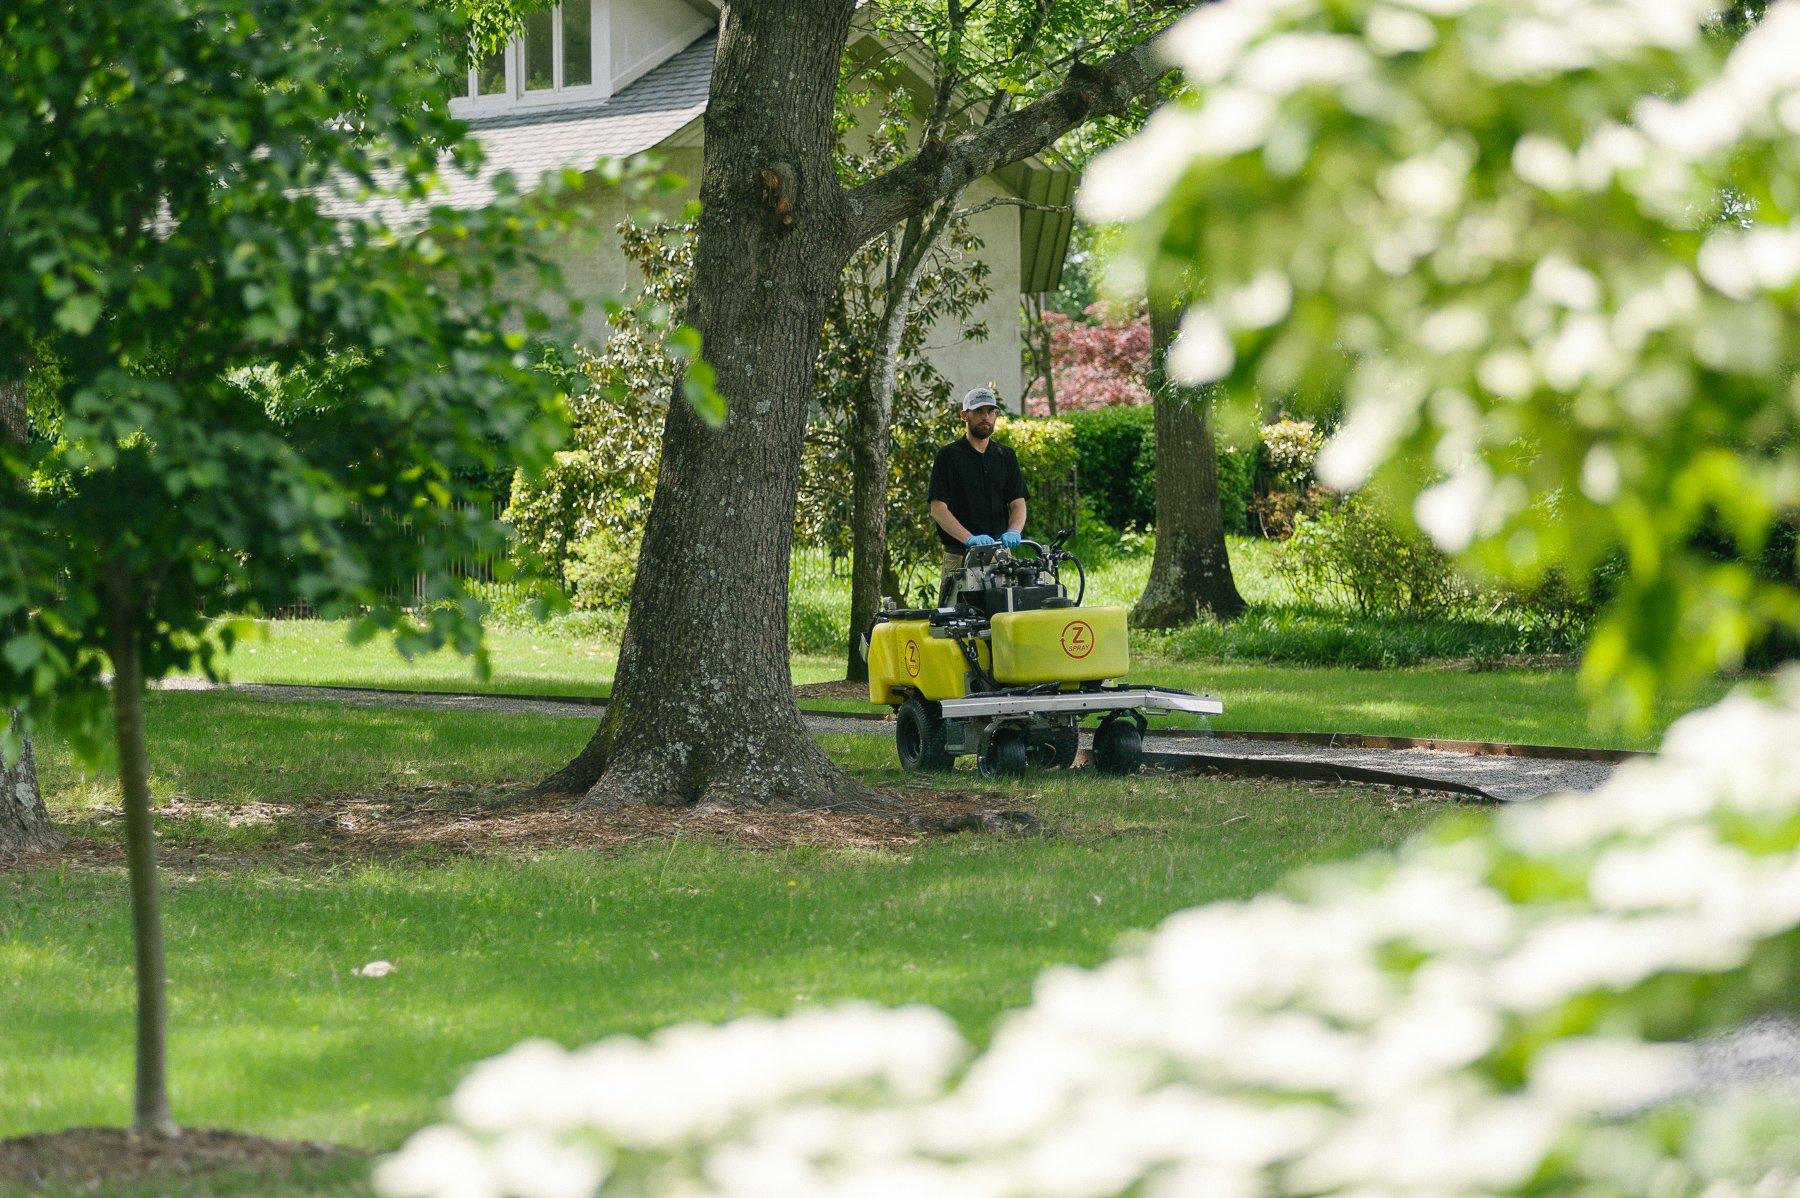 lawn technician near tree with mulch ring